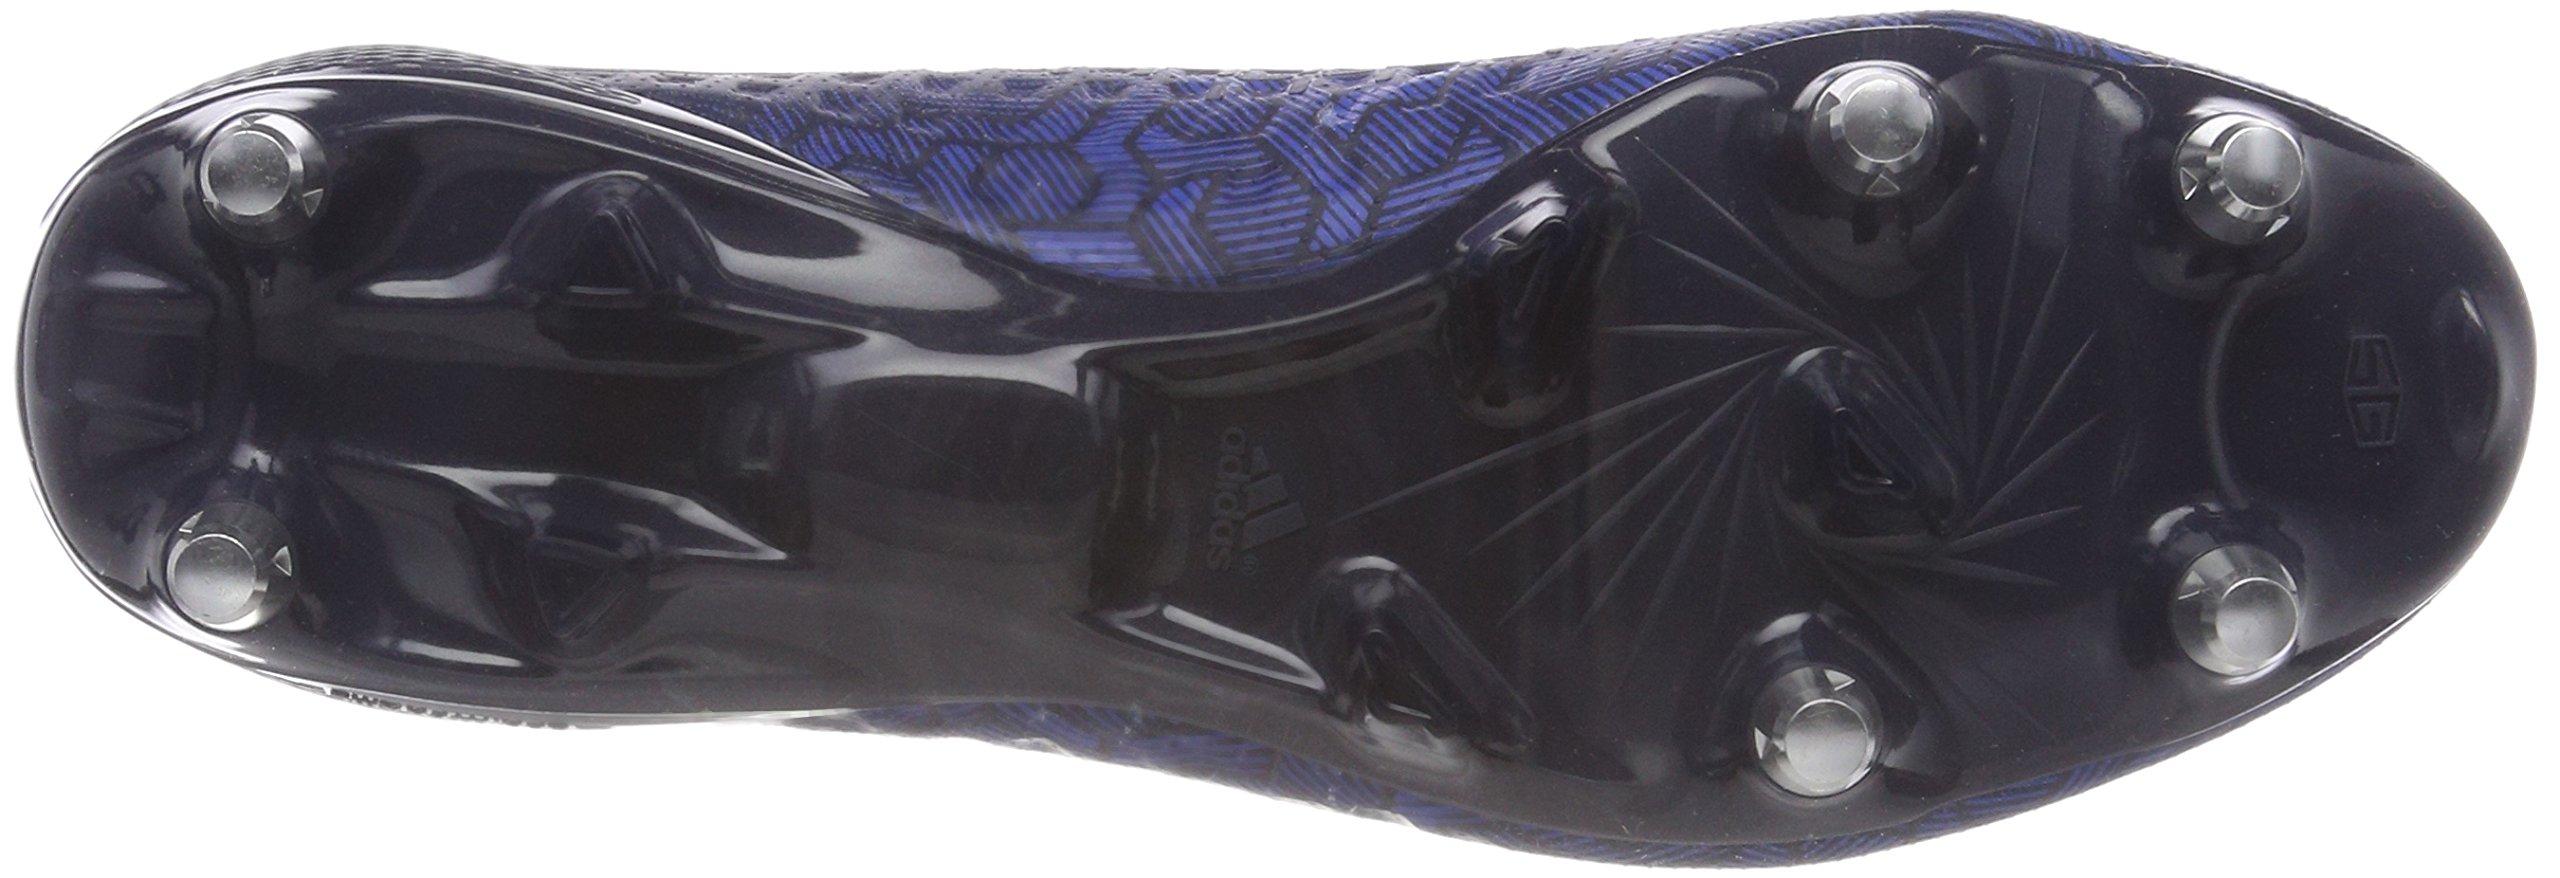 adidas Predator Malice Control (SG), Scarpe da Football Americano Uomo 3 spesavip